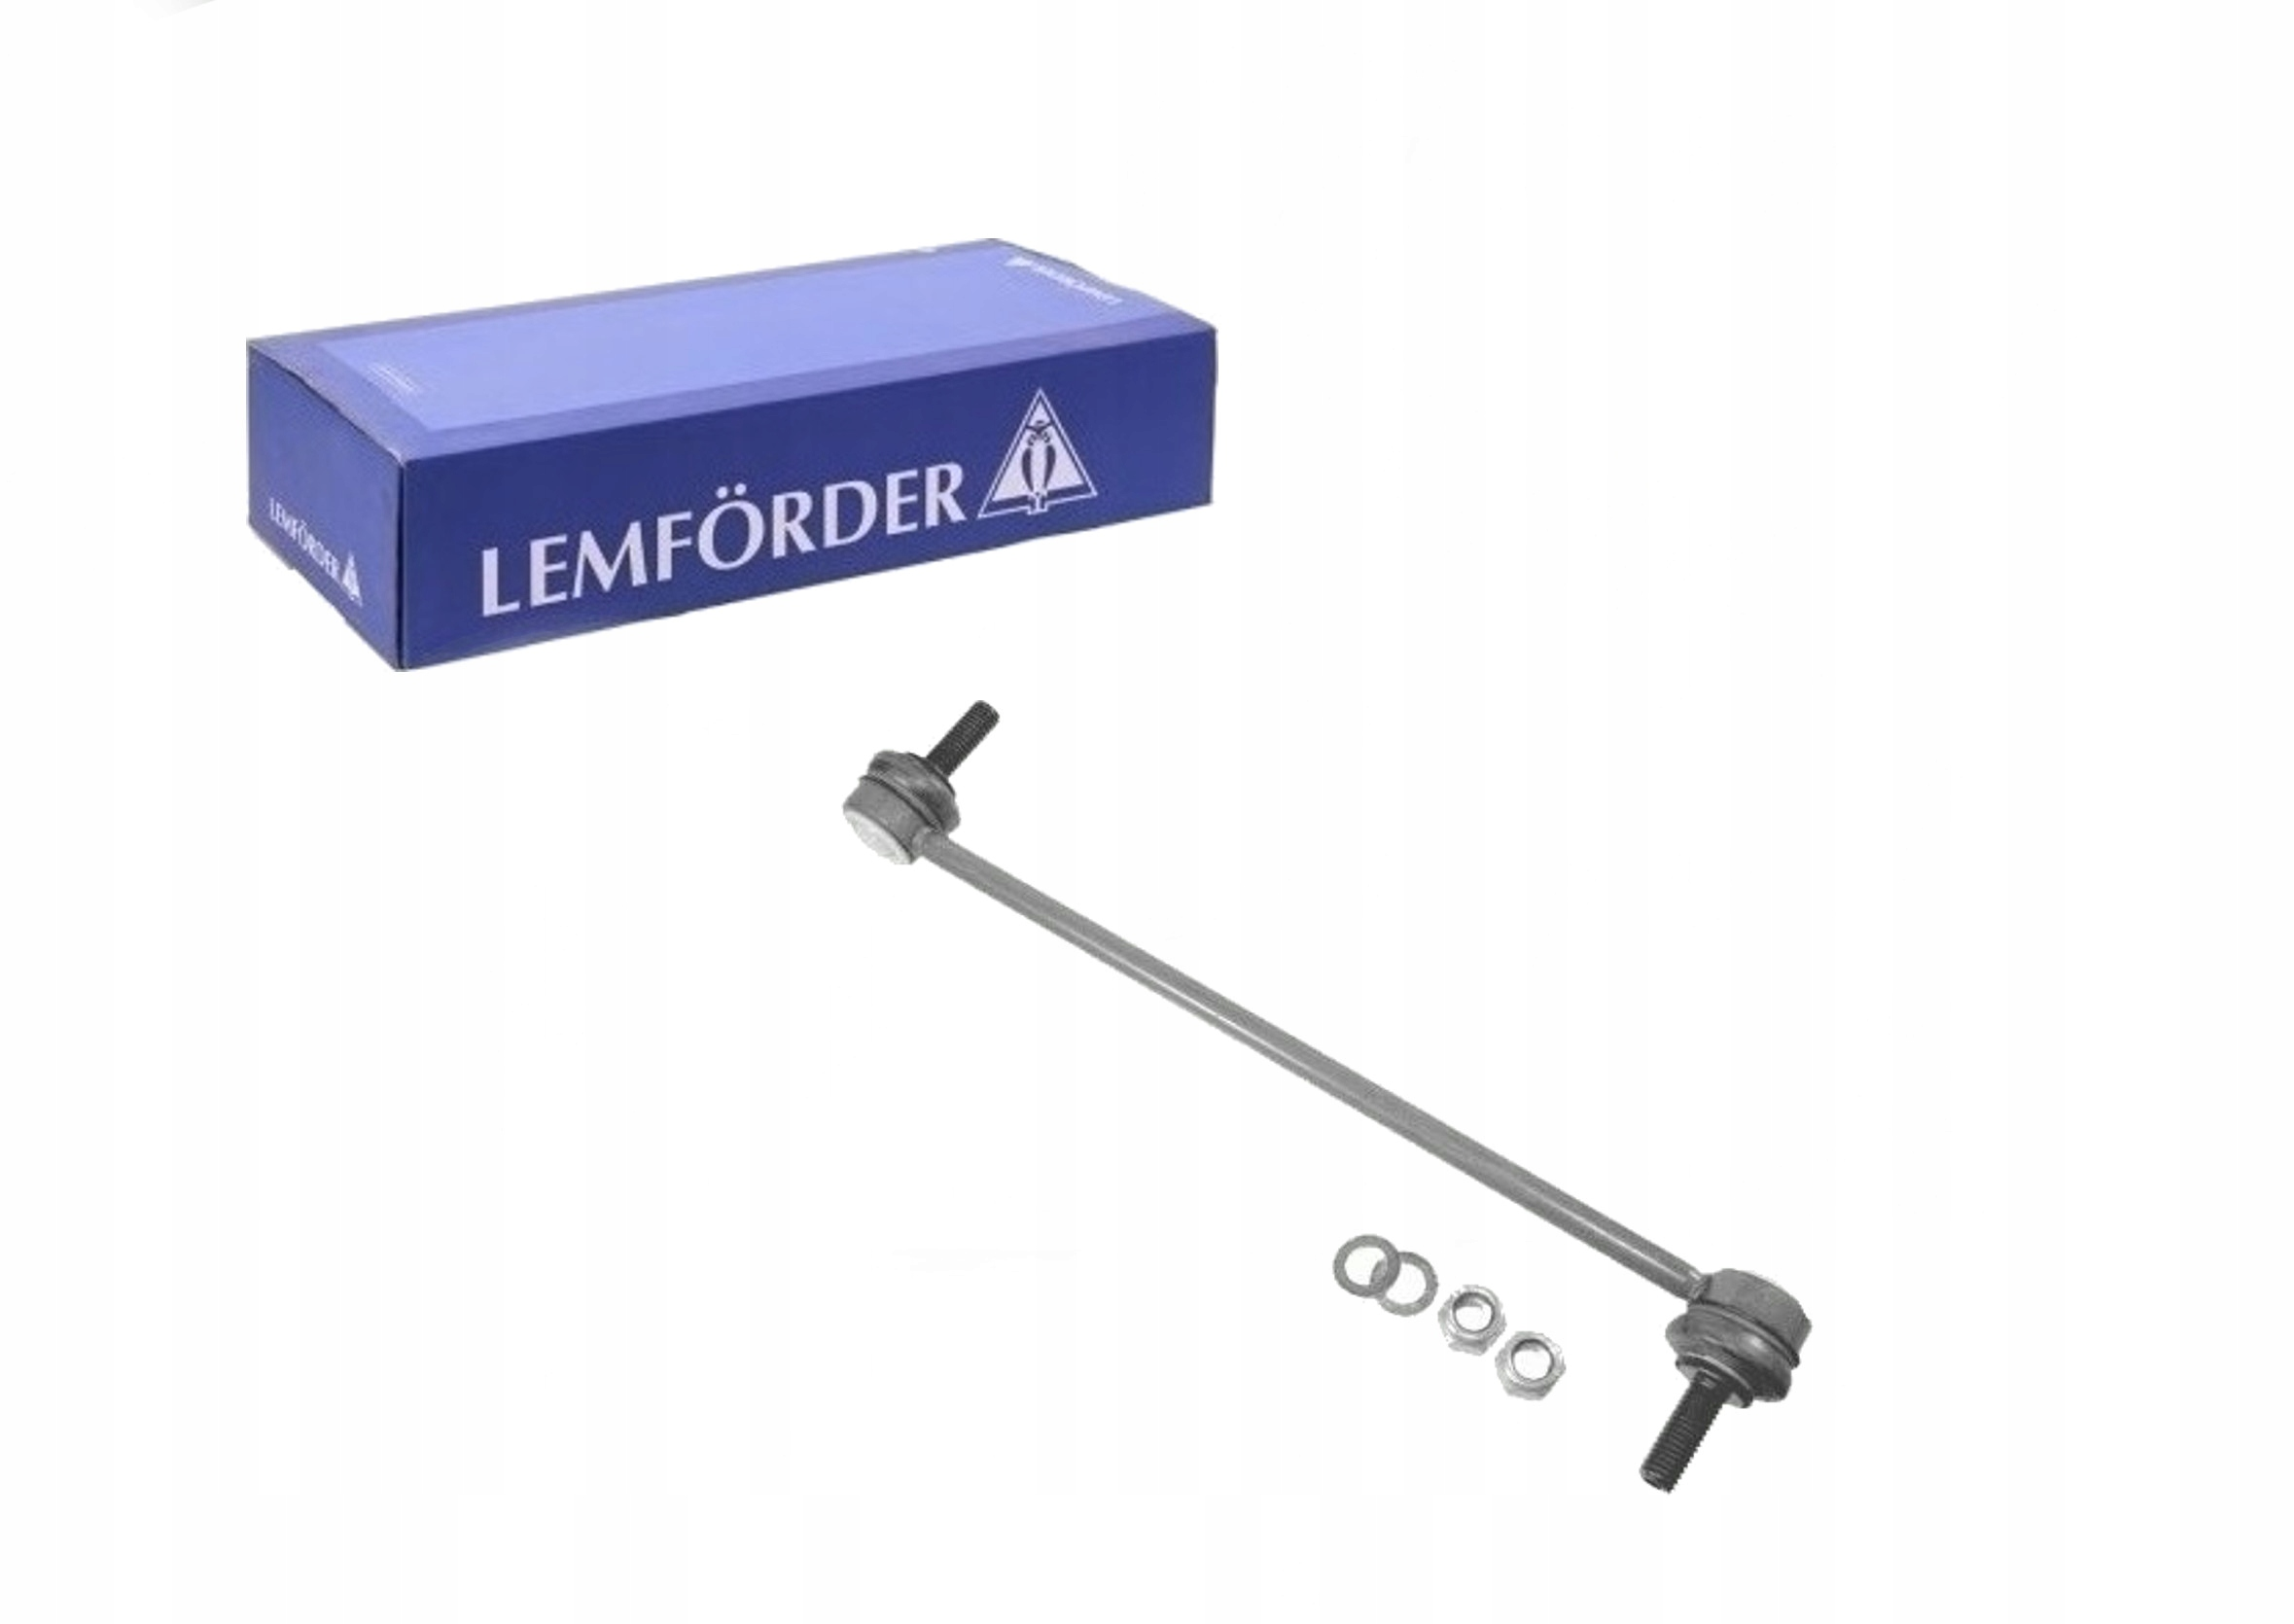 lemforder Крепеж стабилизатора к citroen c5 i